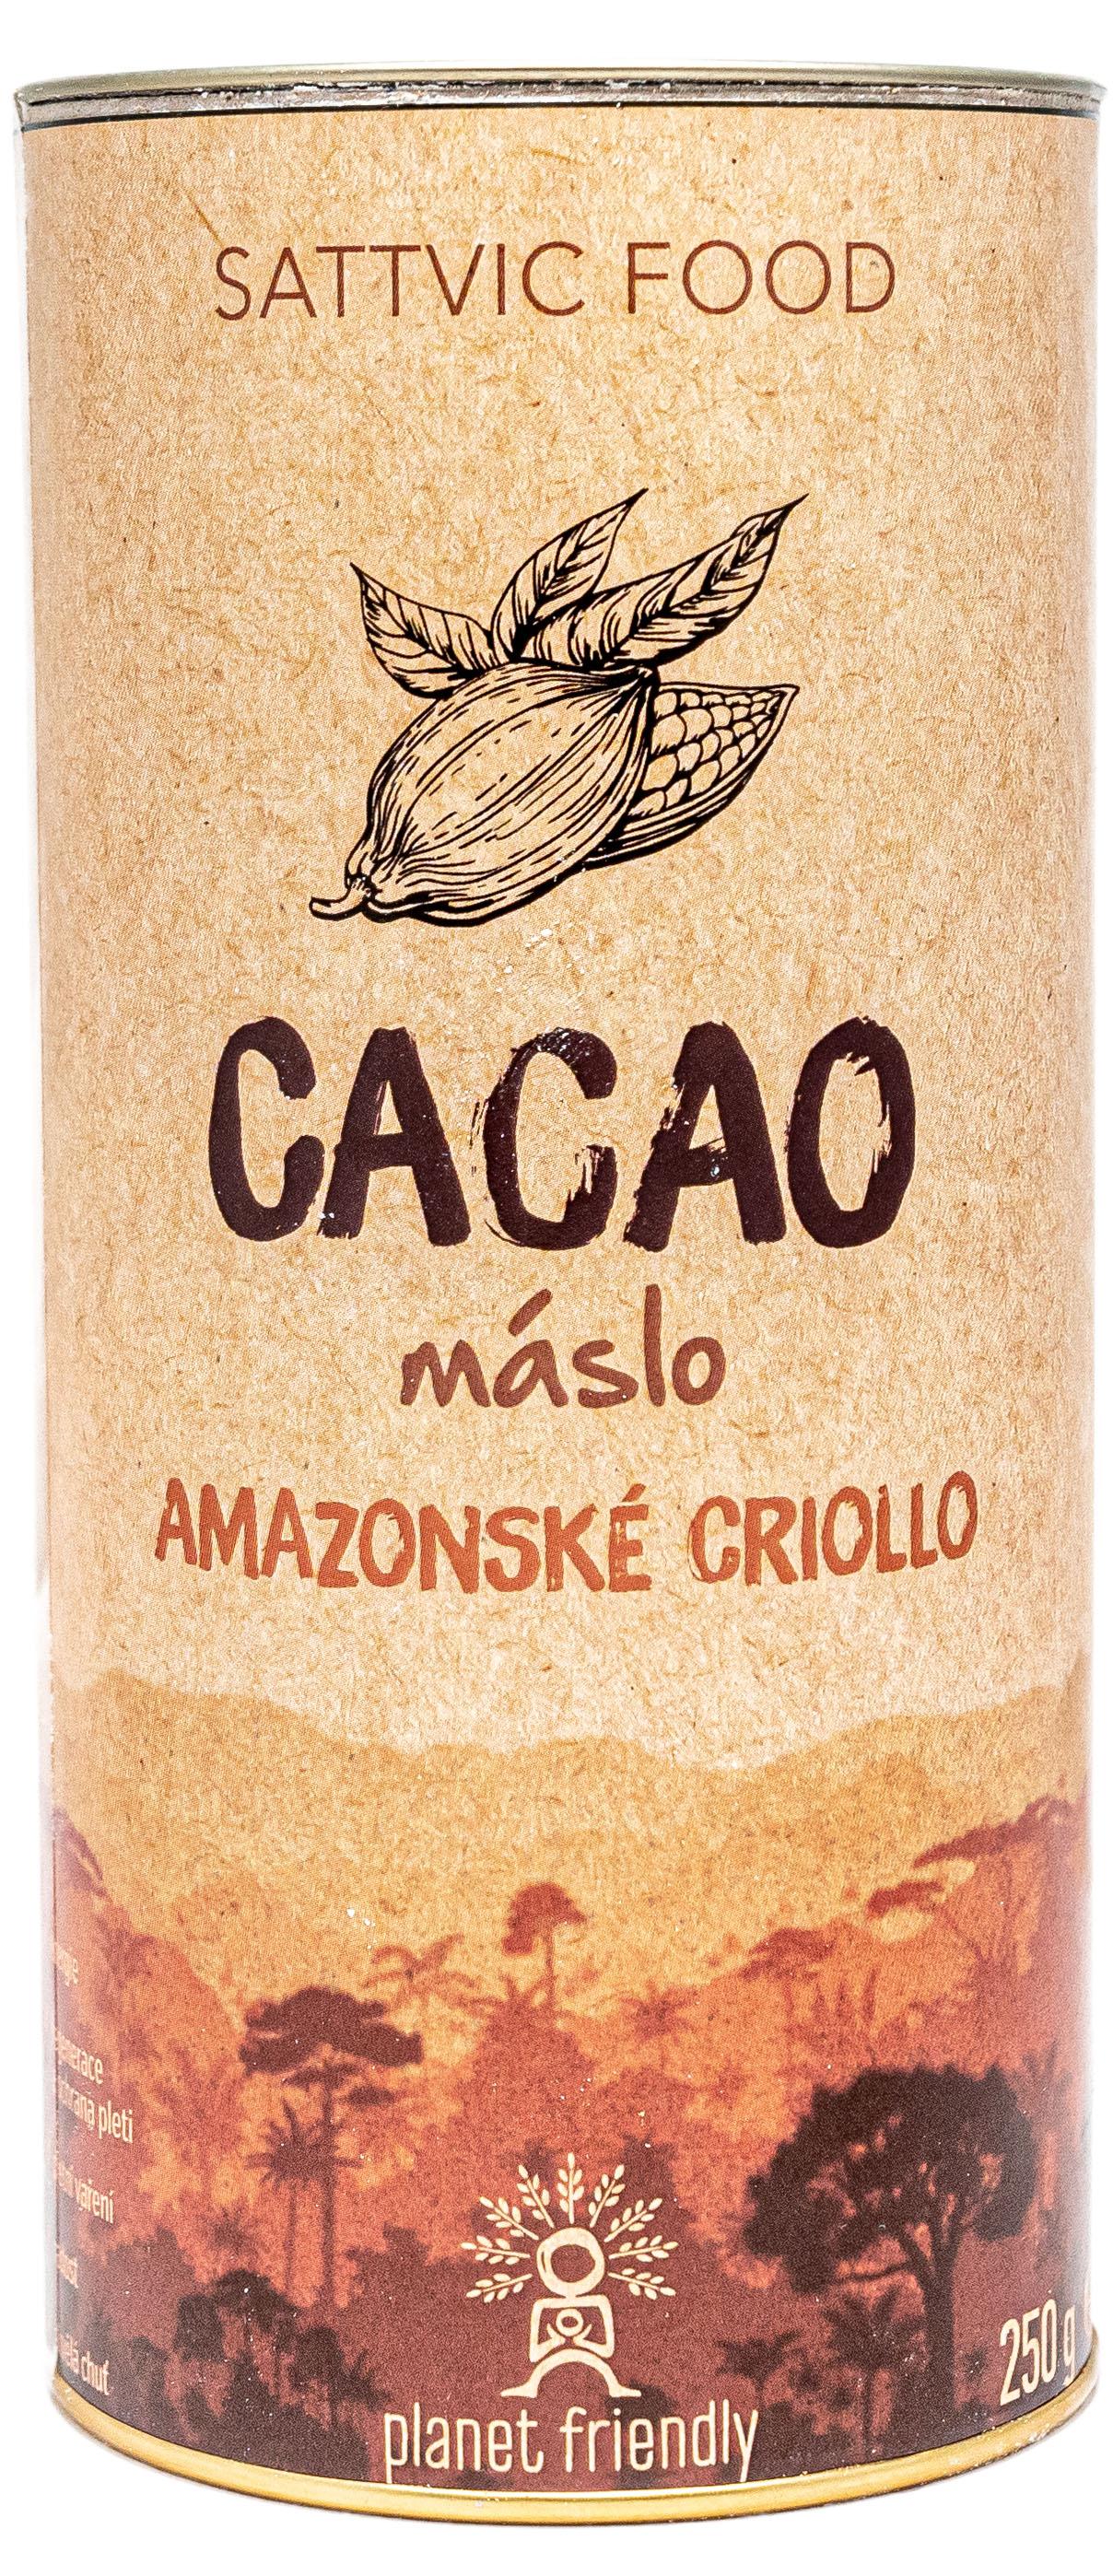 Planet Friendly Cacao Criollo máslo - peruánské kakao, 250 g